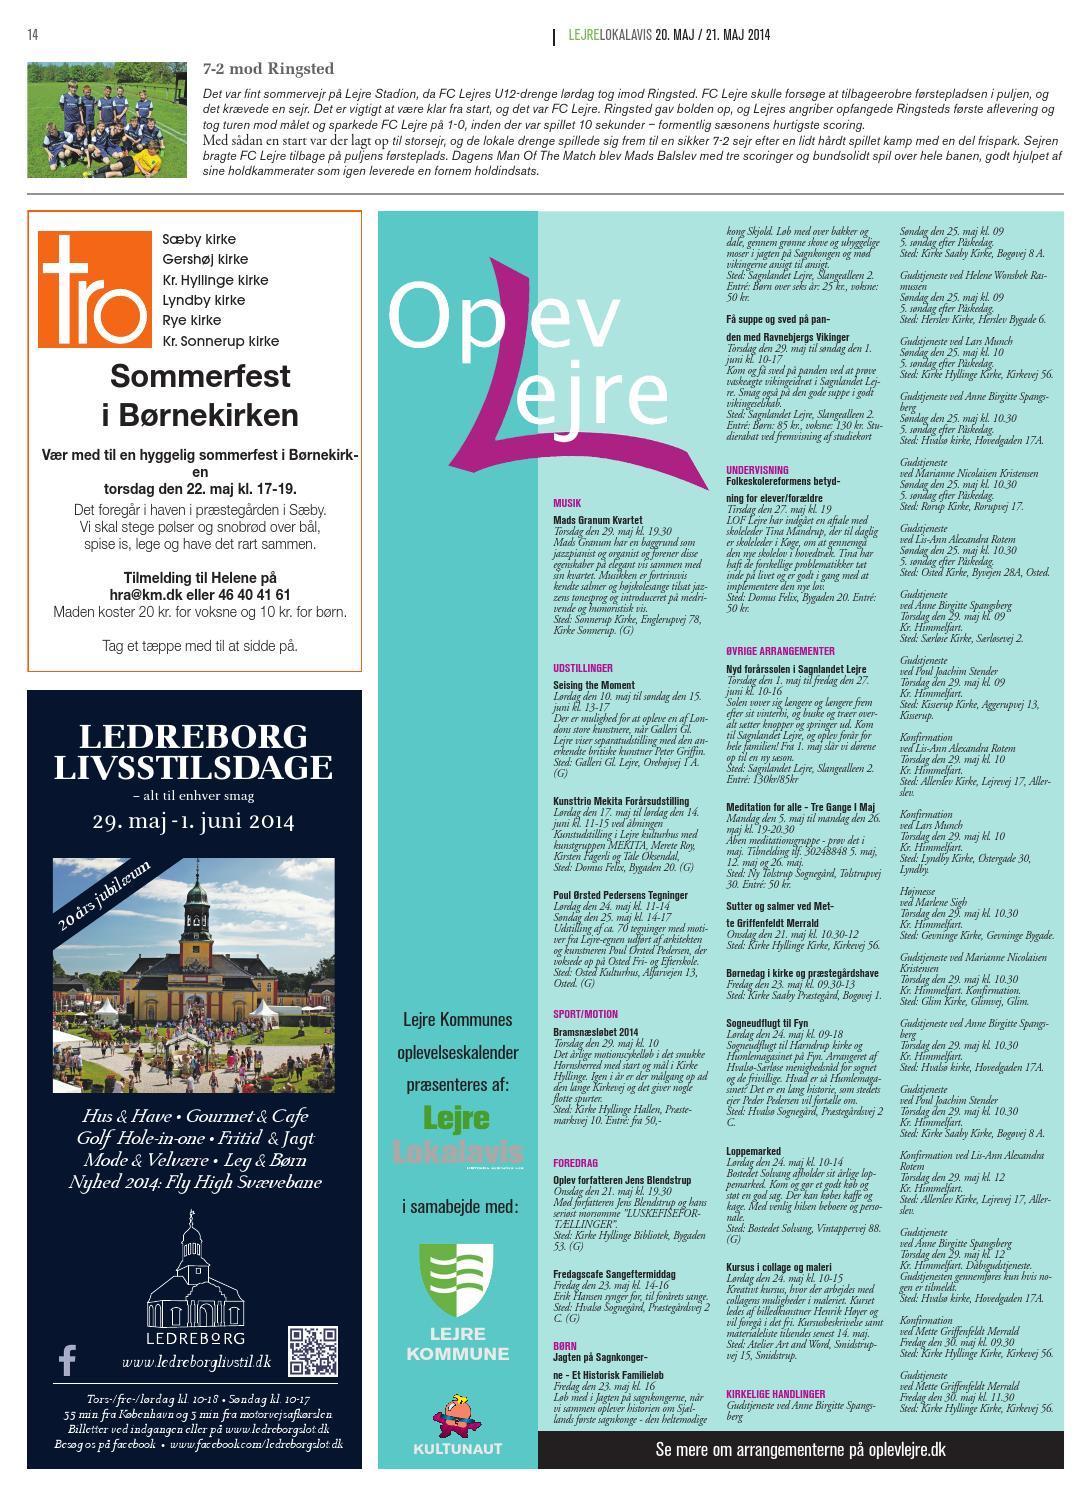 Lejre lokalavis uge 21 2014 by Lejre Lokalavis - issuu edf7a11f21fe8